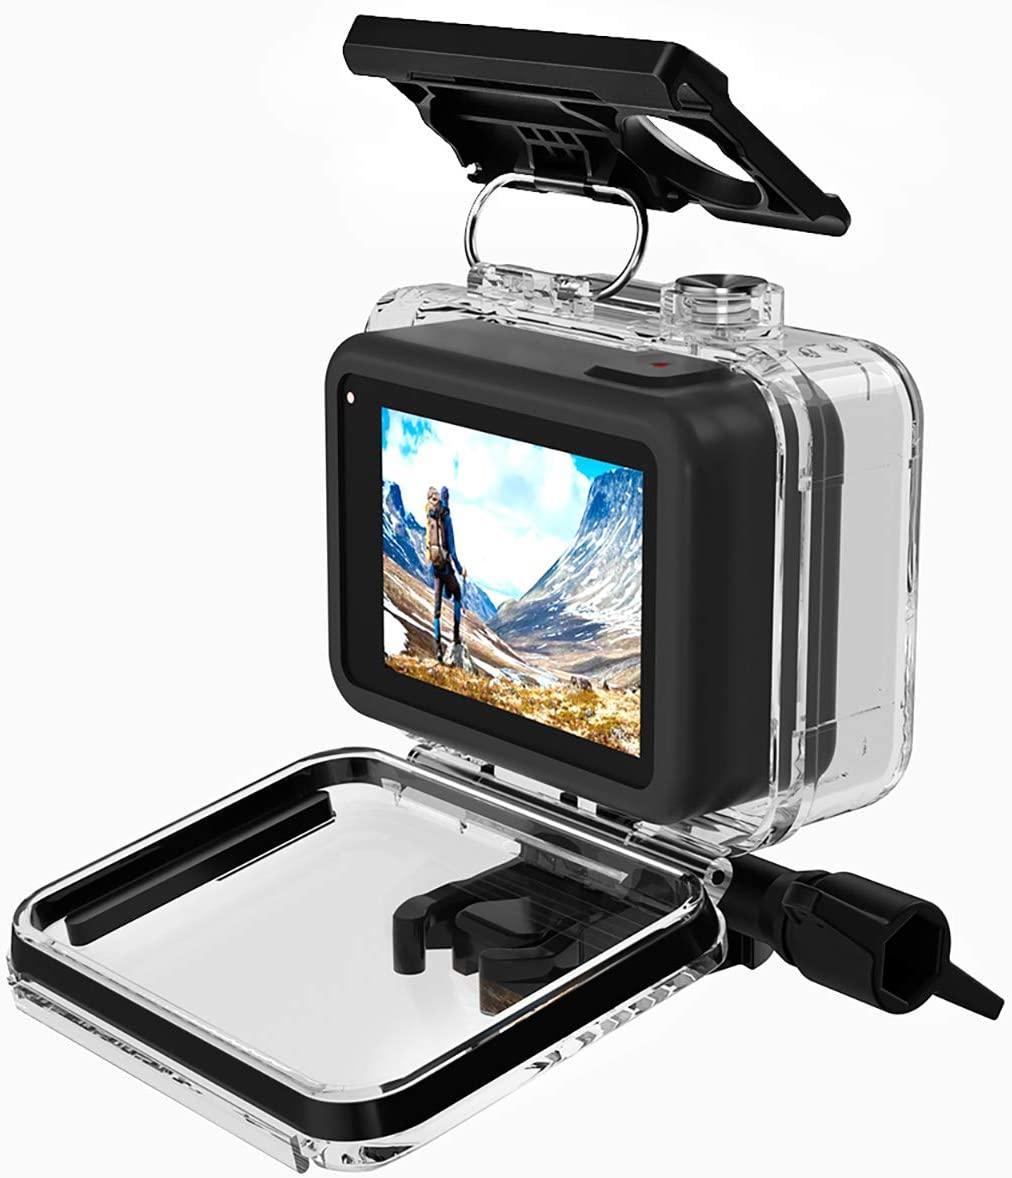 ULANZI G8-1 Waterproof Housing Case for GoPro Hero 8, Diving/Swimming Vlogging Accessories